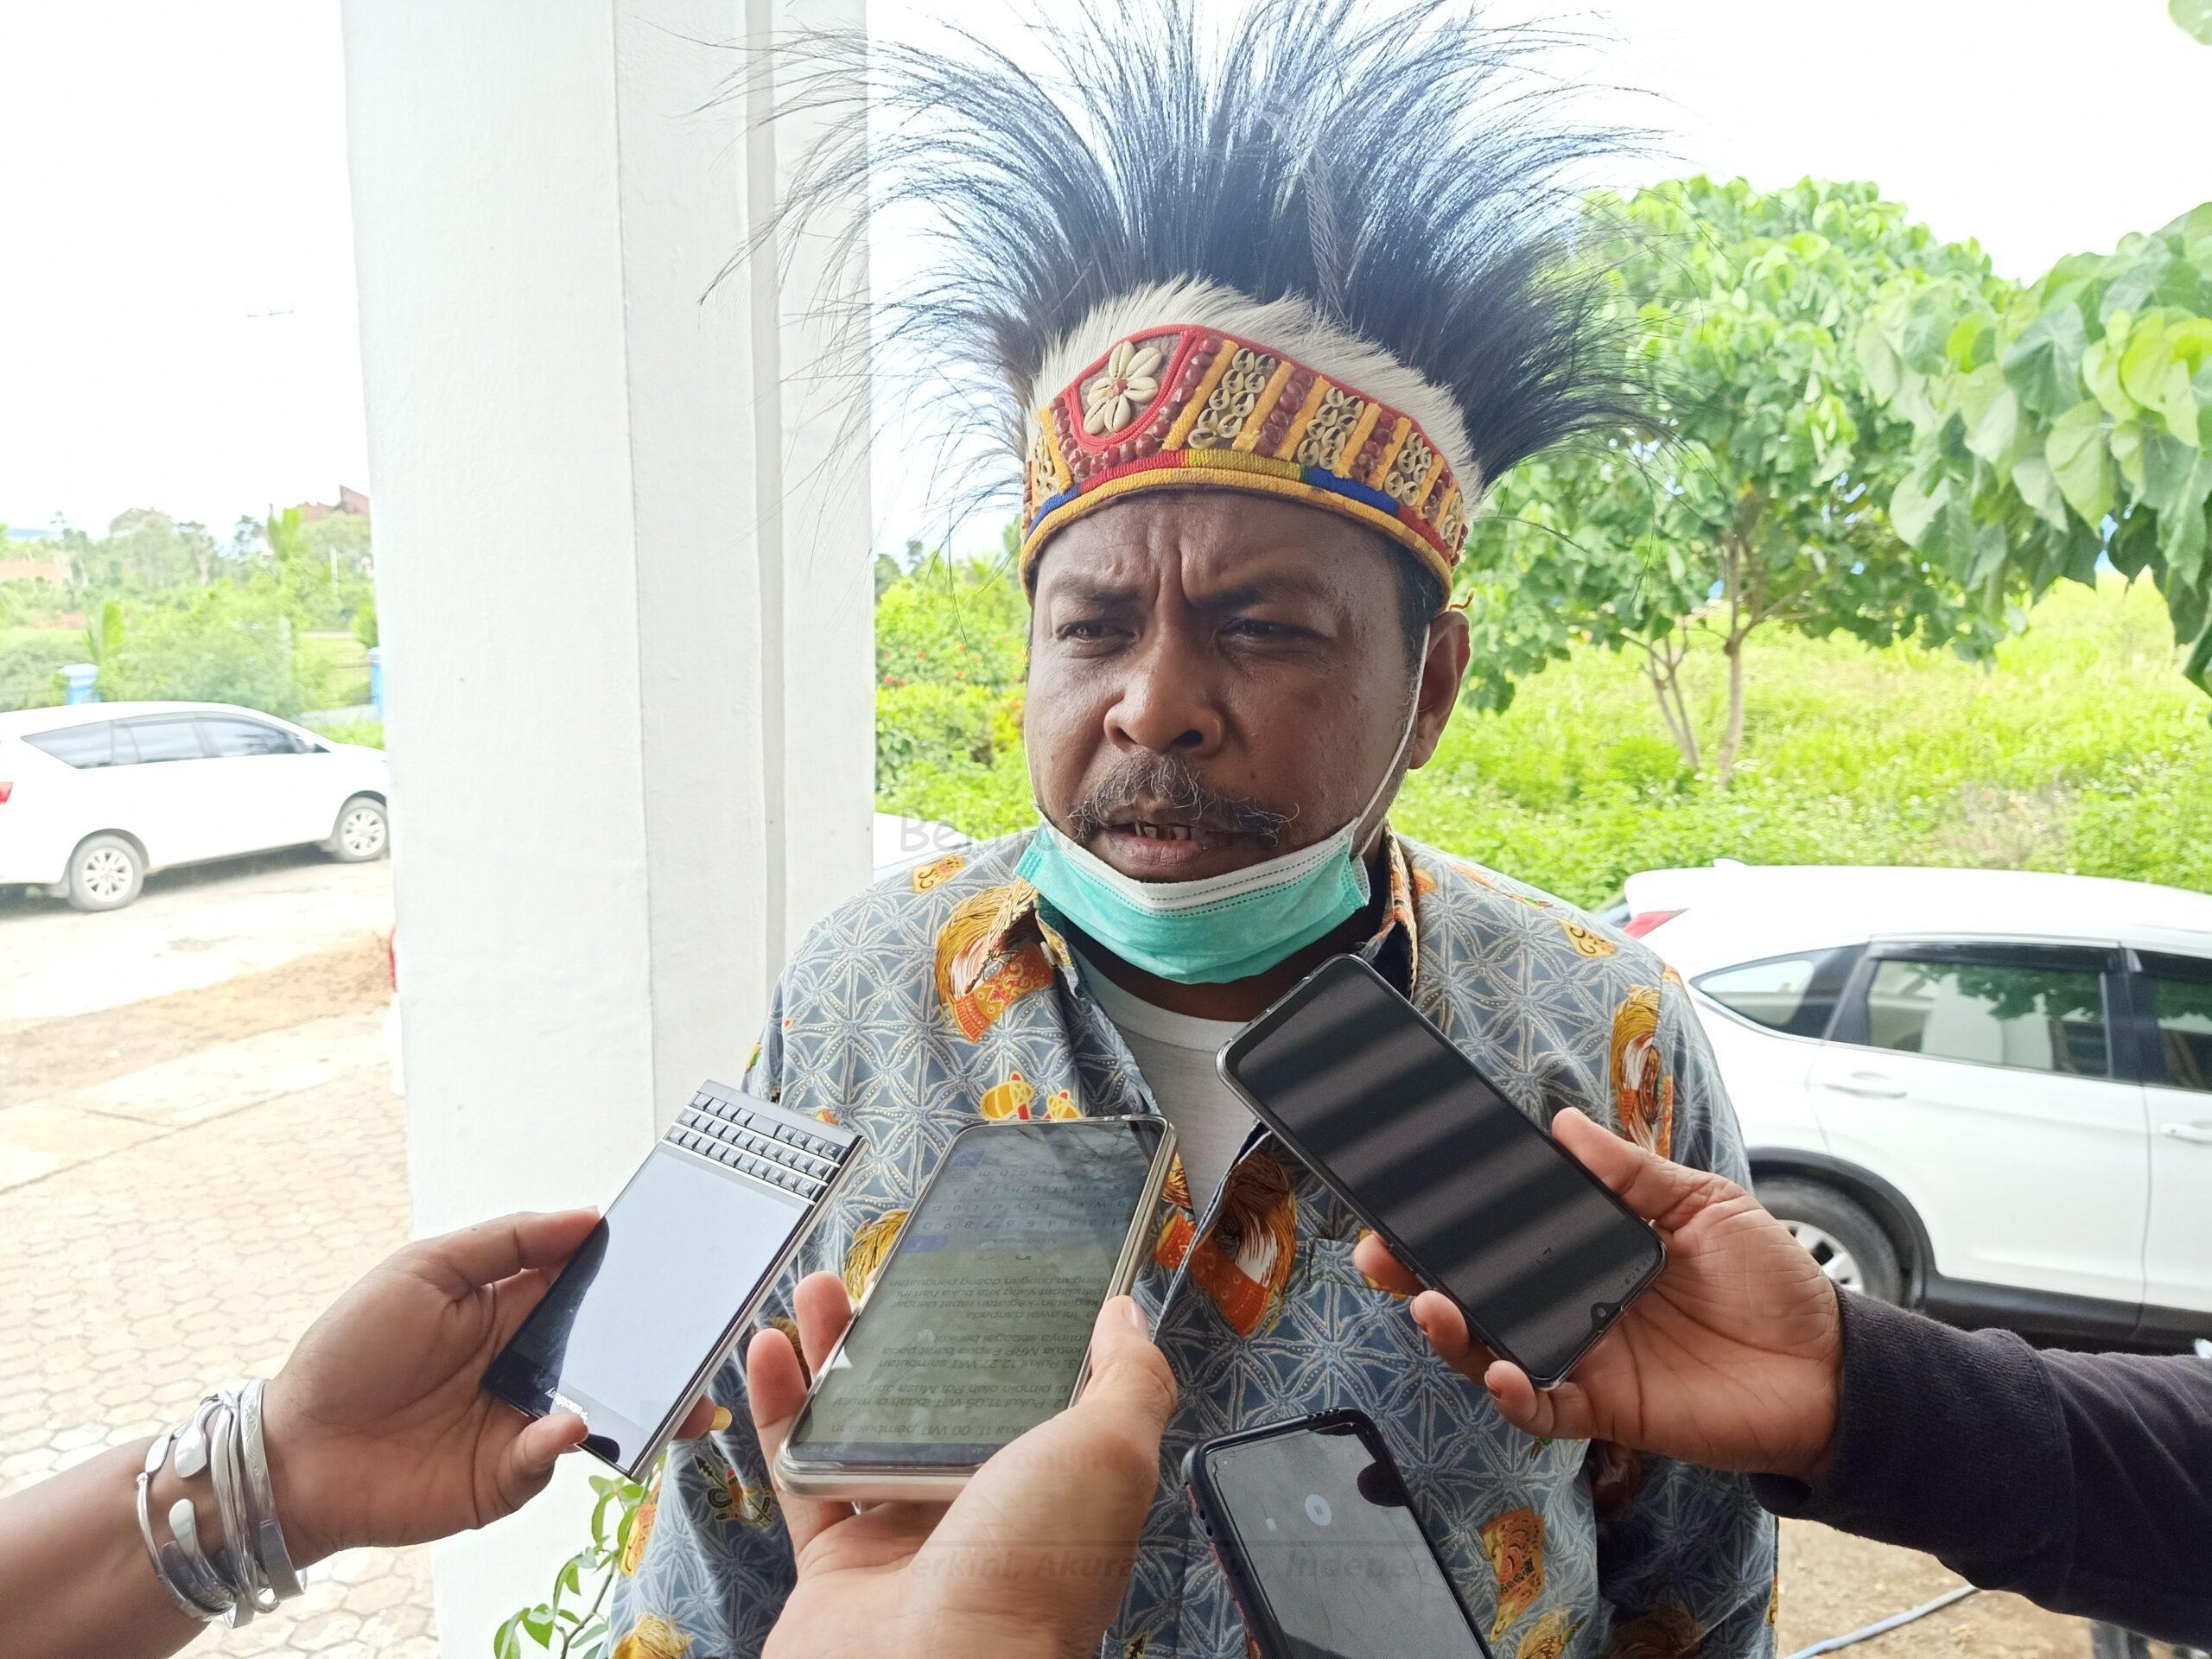 Ketua MRP PB: Data Pemohon Rekomendasi Bintara Otsus Membludak 2 IMG20200924124836 scaled